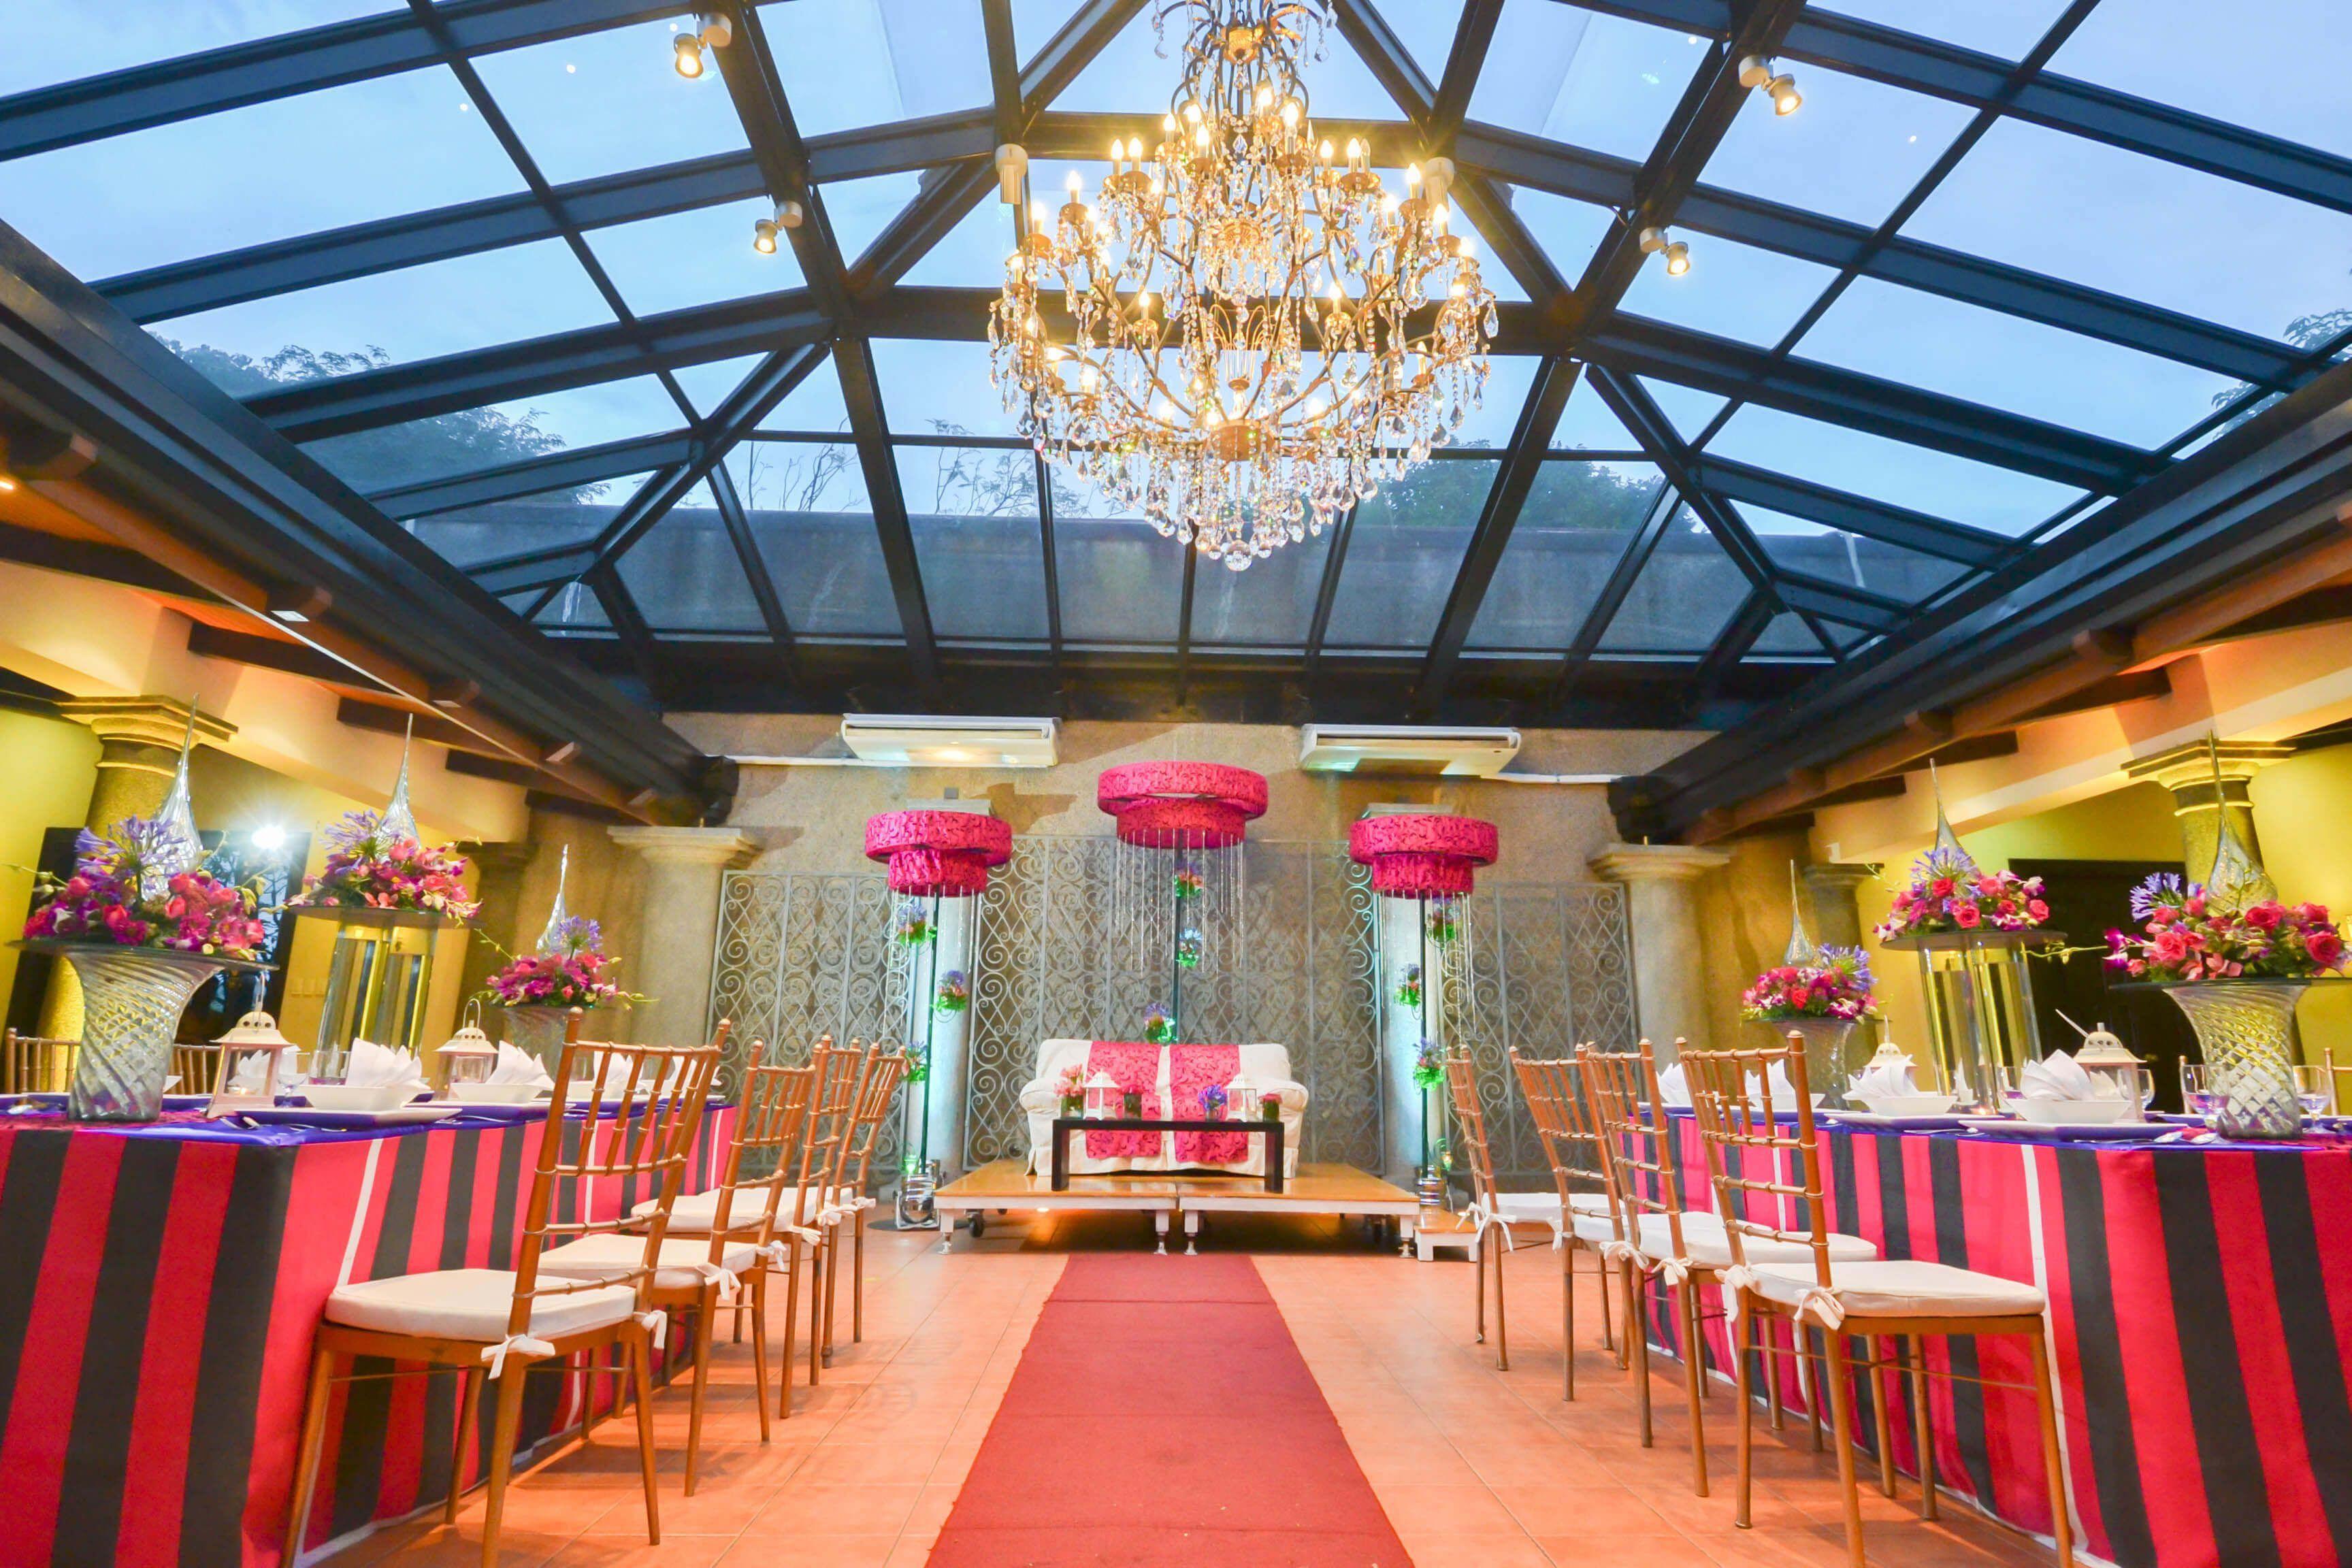 Wedding Reception Decoration Ideas Reviewweddingwebsites Refferal 2272684299 In 2020 Wedding Reception Decorations Wedding Dress Alterations Wedding Website